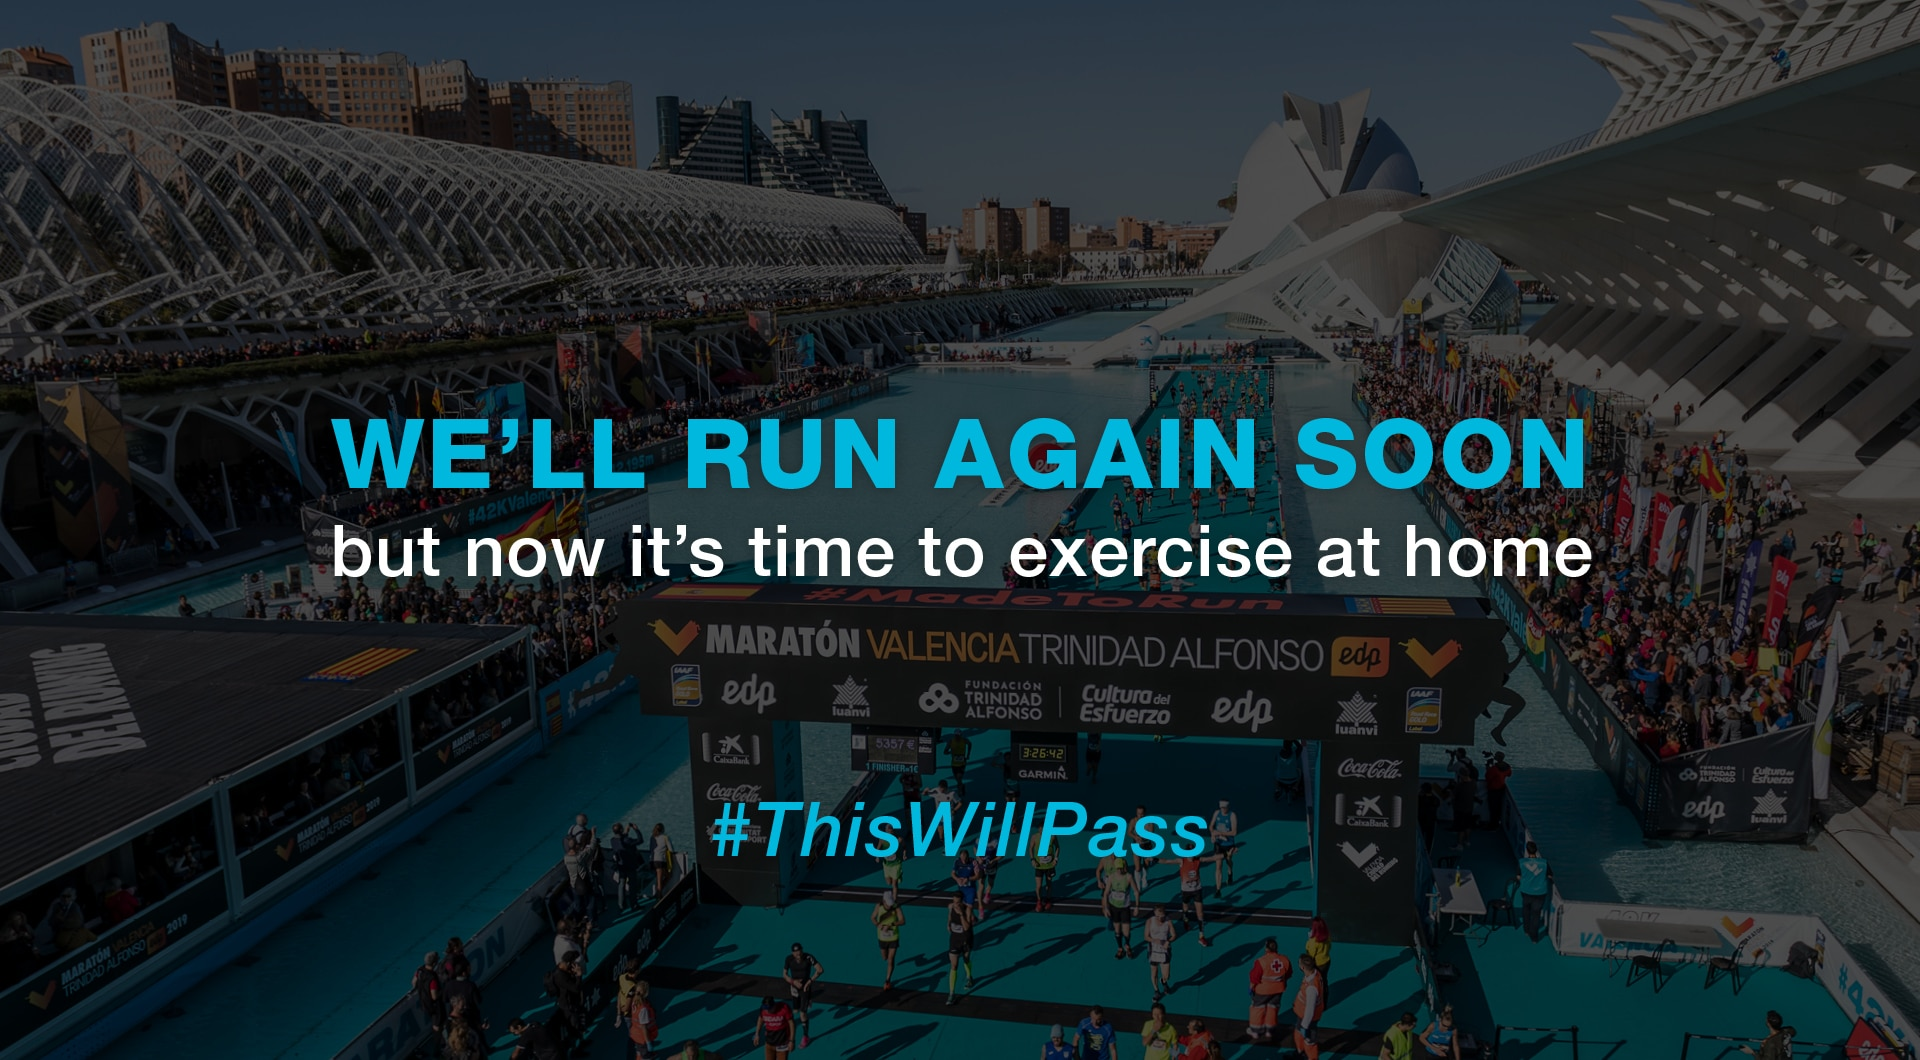 This will pass - Valencia Marathon